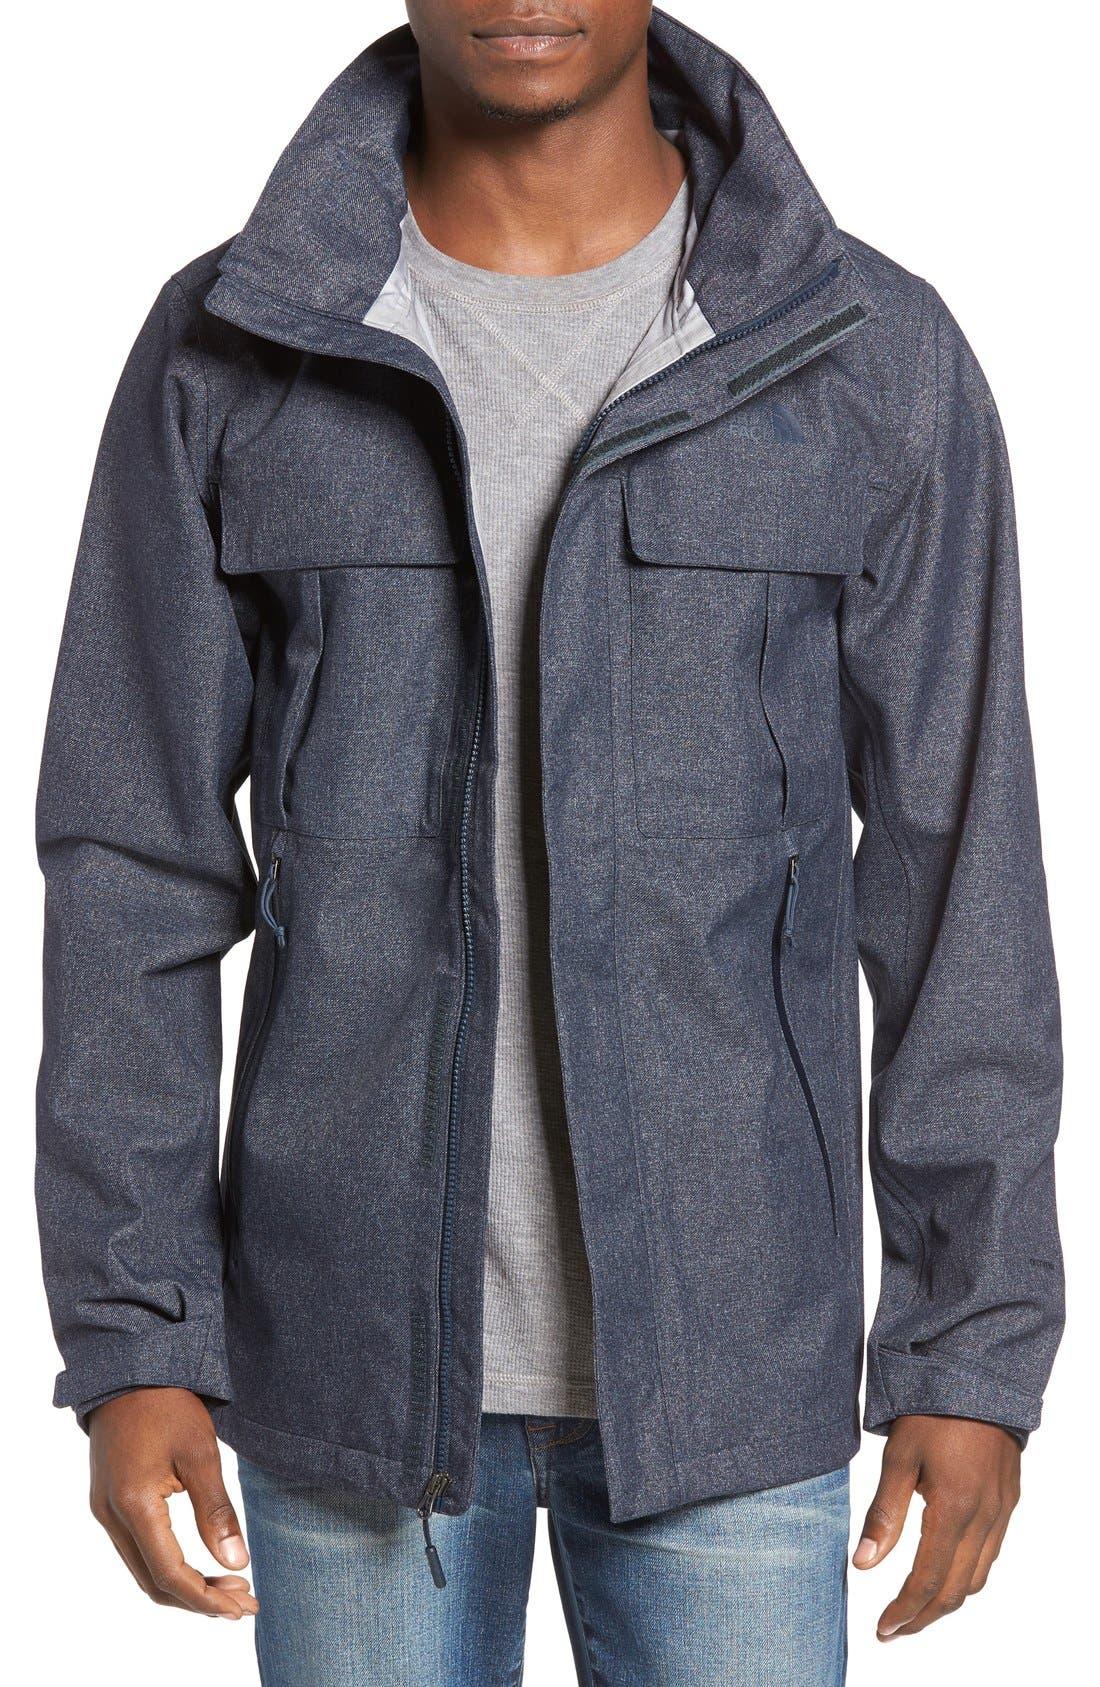 Alternate Image 1 Selected - The North Face Kassler DryVent Field Jacket